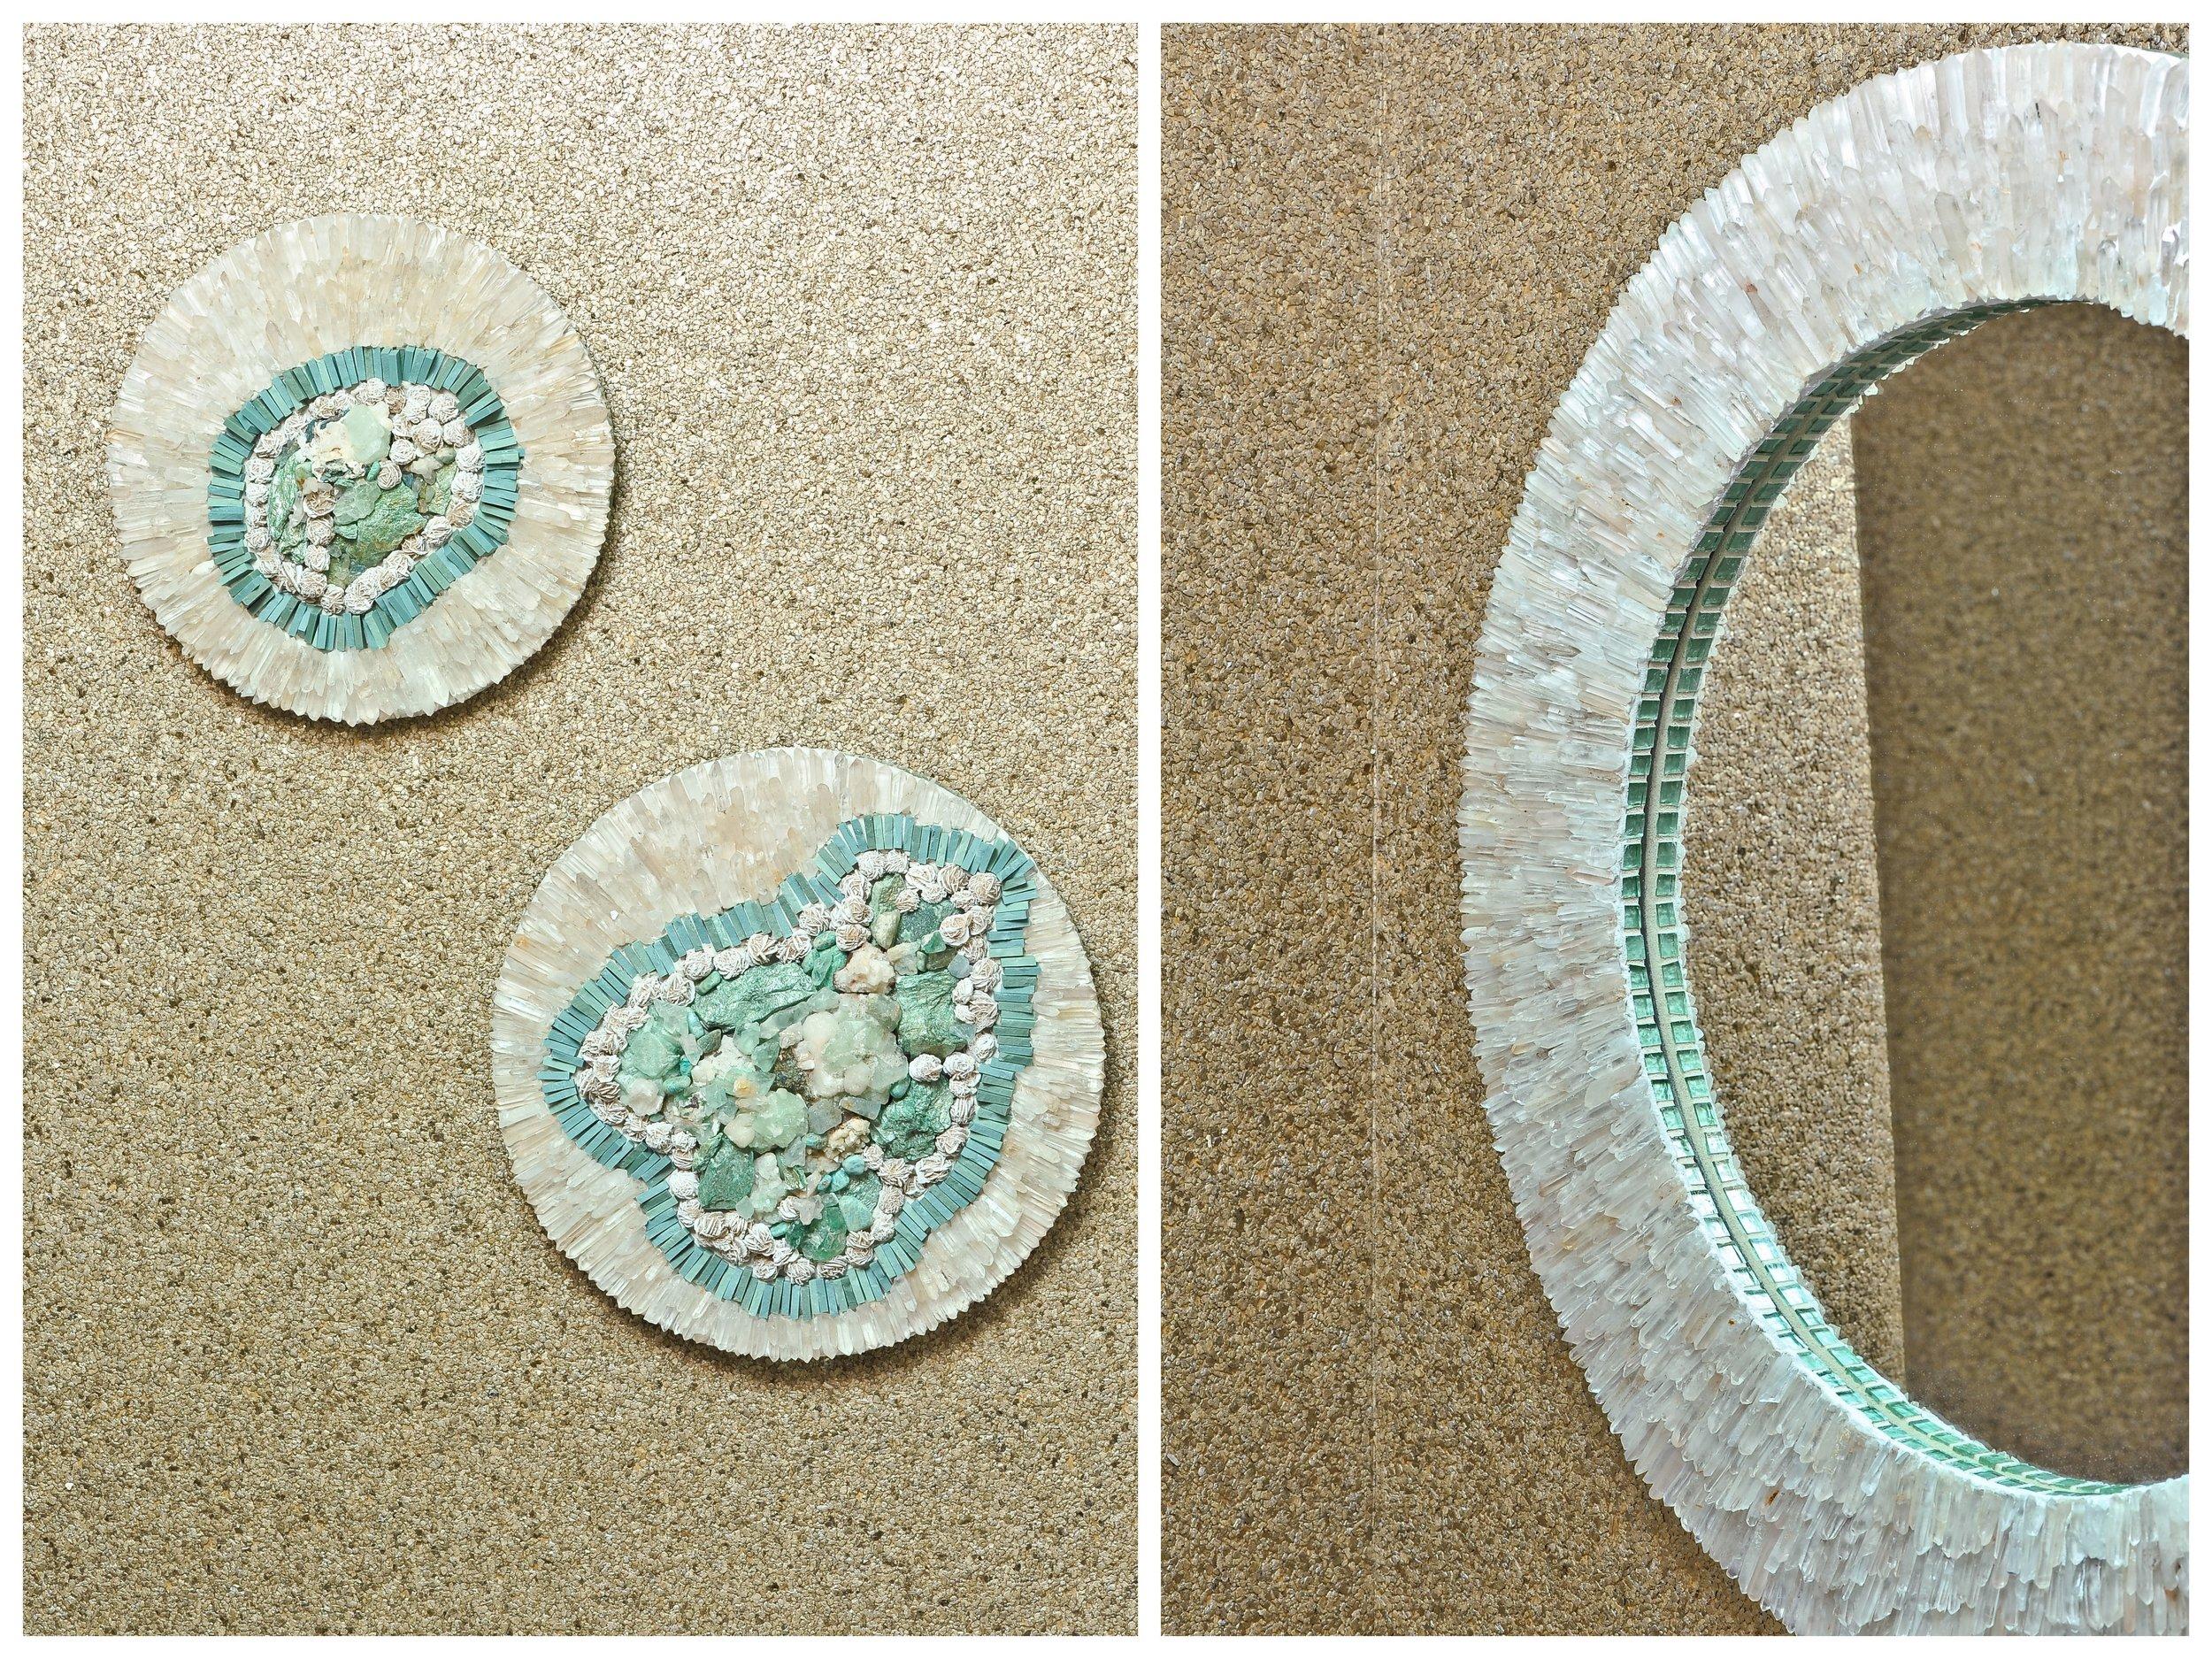 Aqua Mineral Powder Room connie broom2.jpg